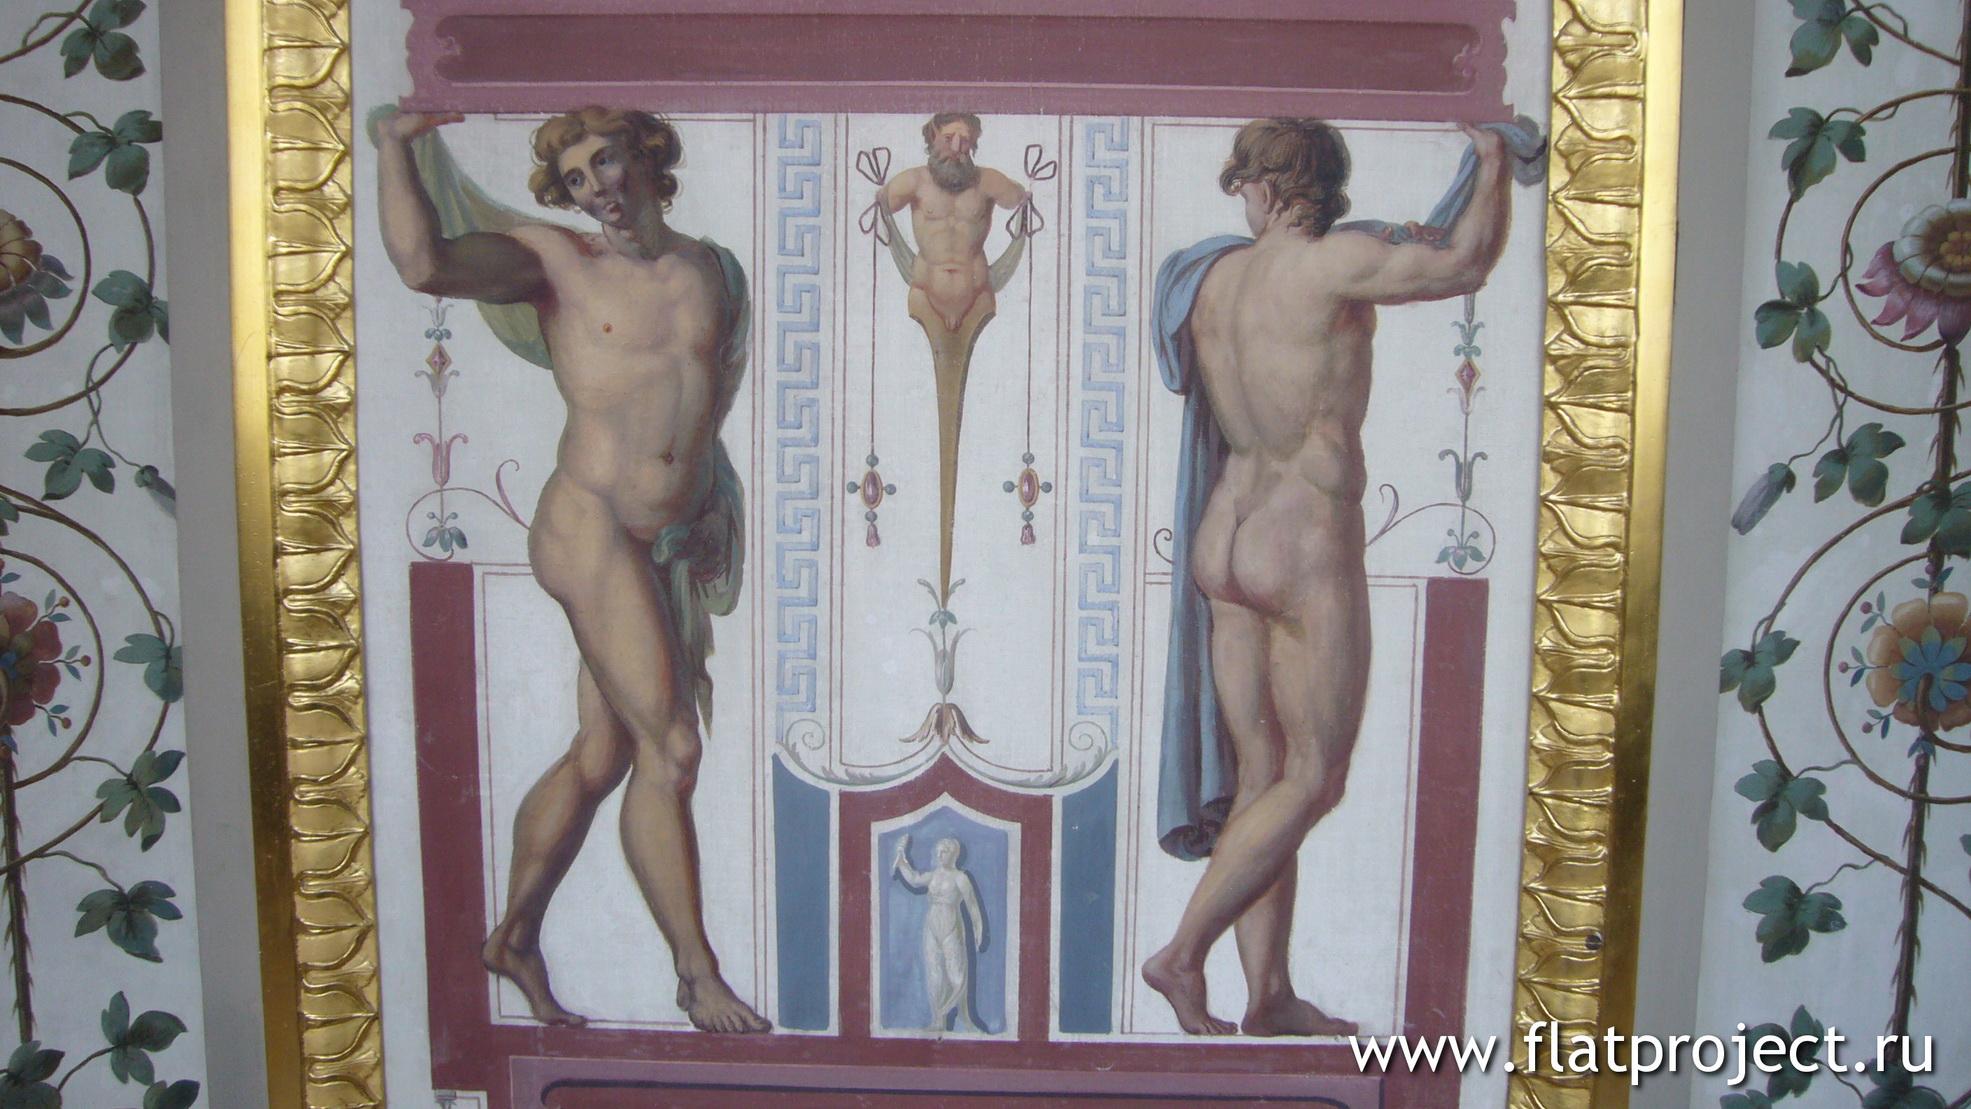 The State Hermitage museum interiors – photo 154